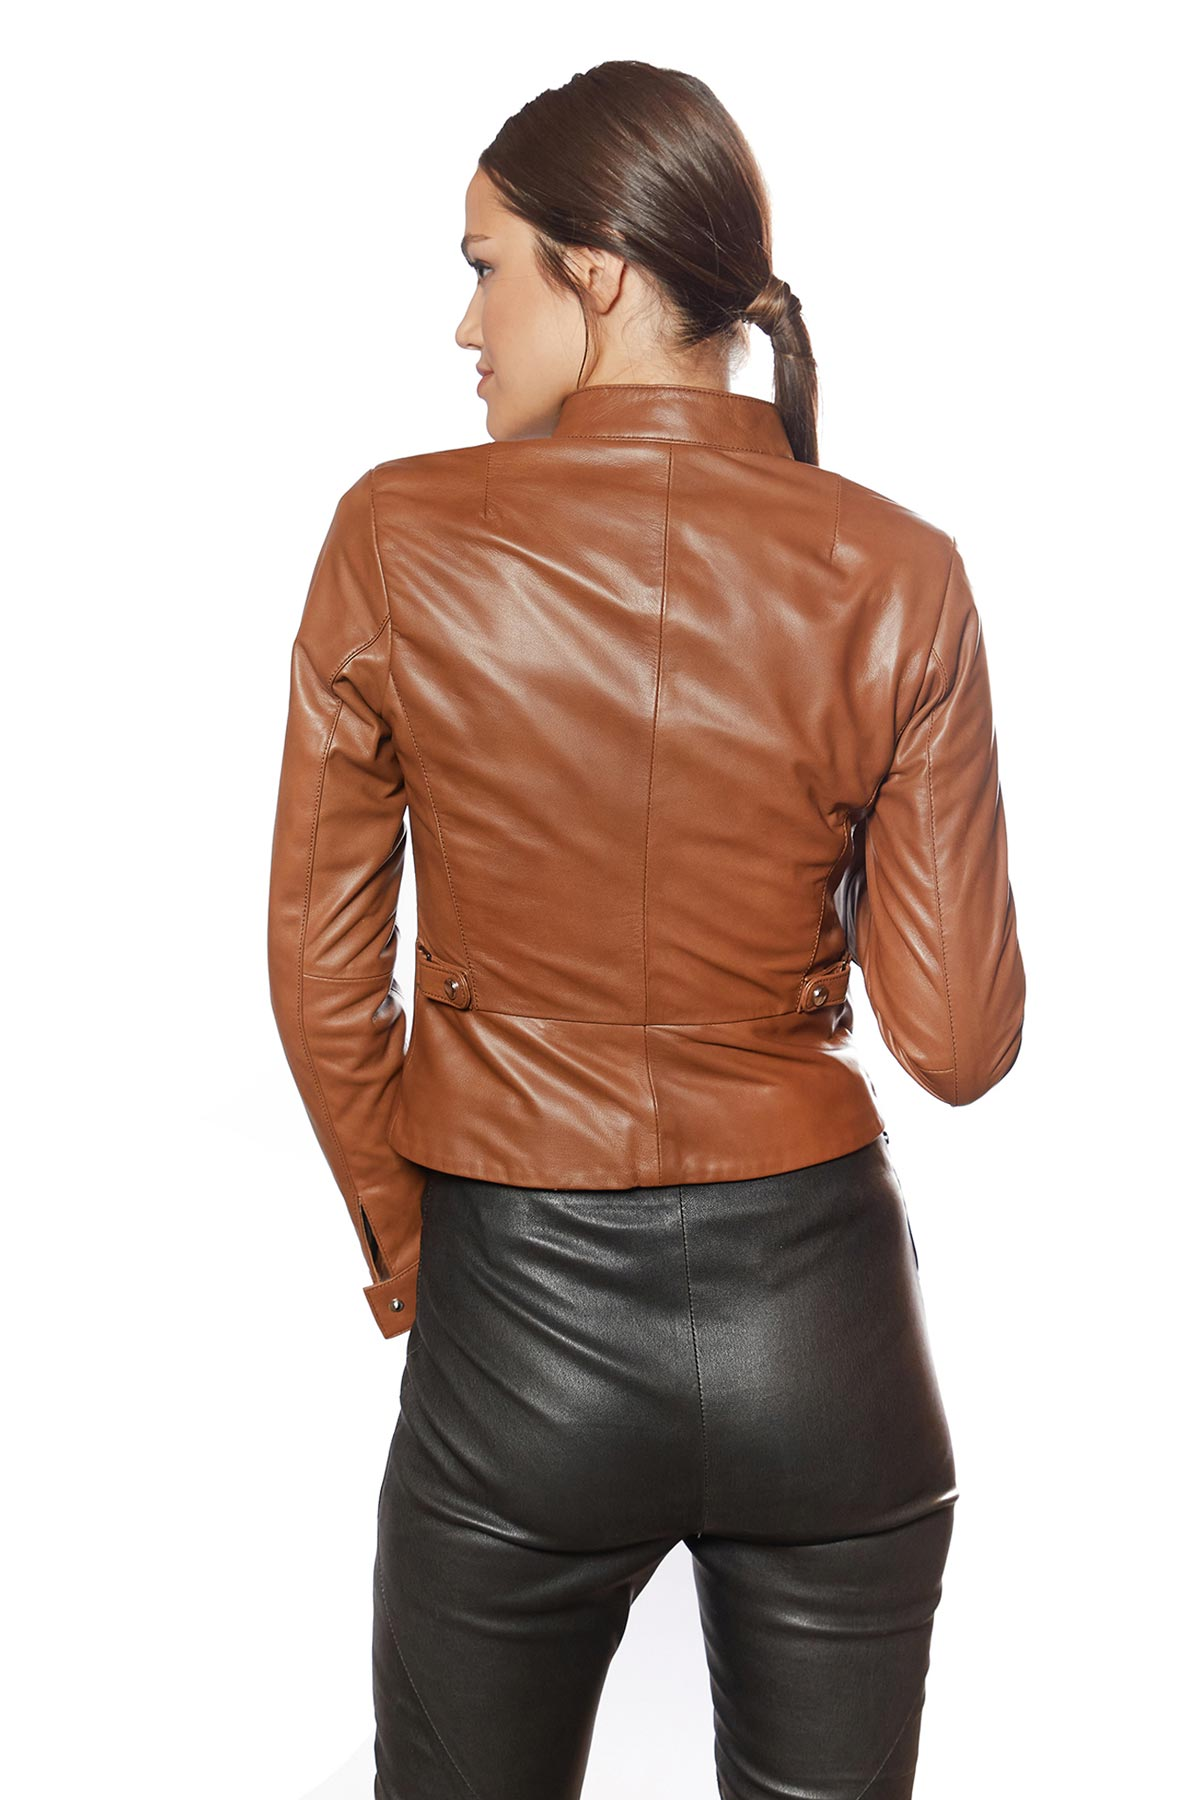 real mccoy leather jacket